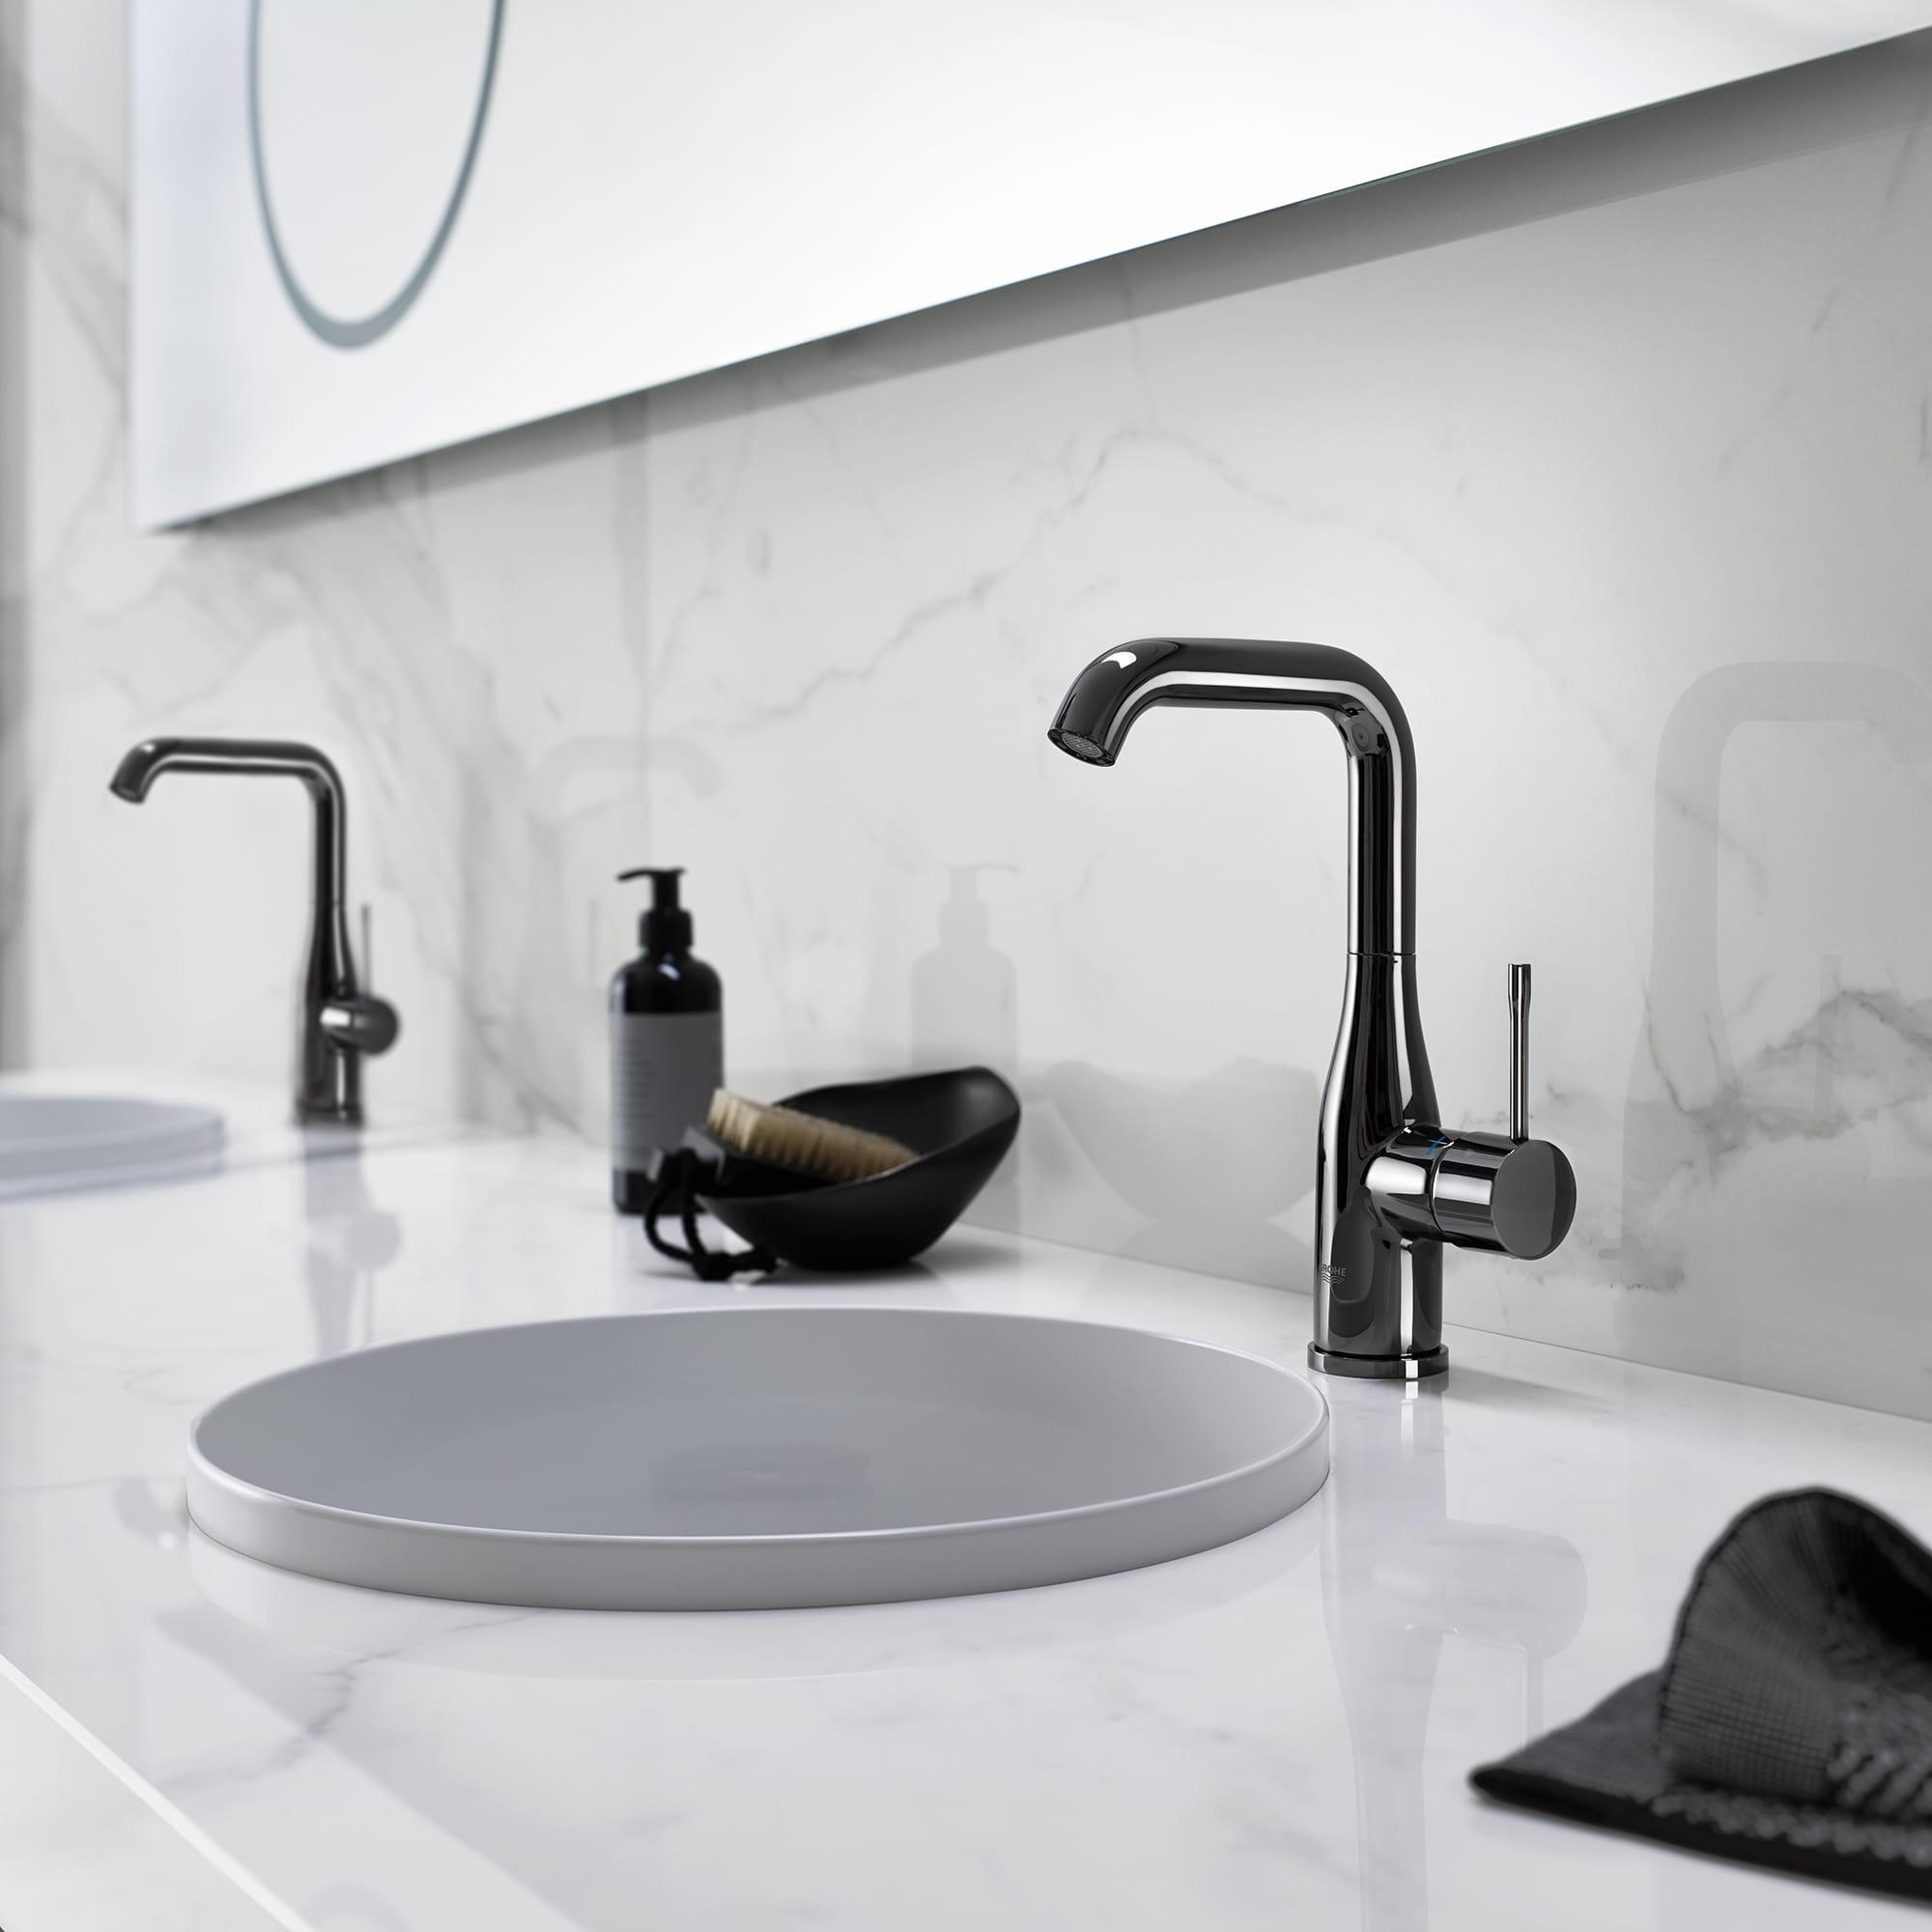 Essence Bathroom Sink Faucets